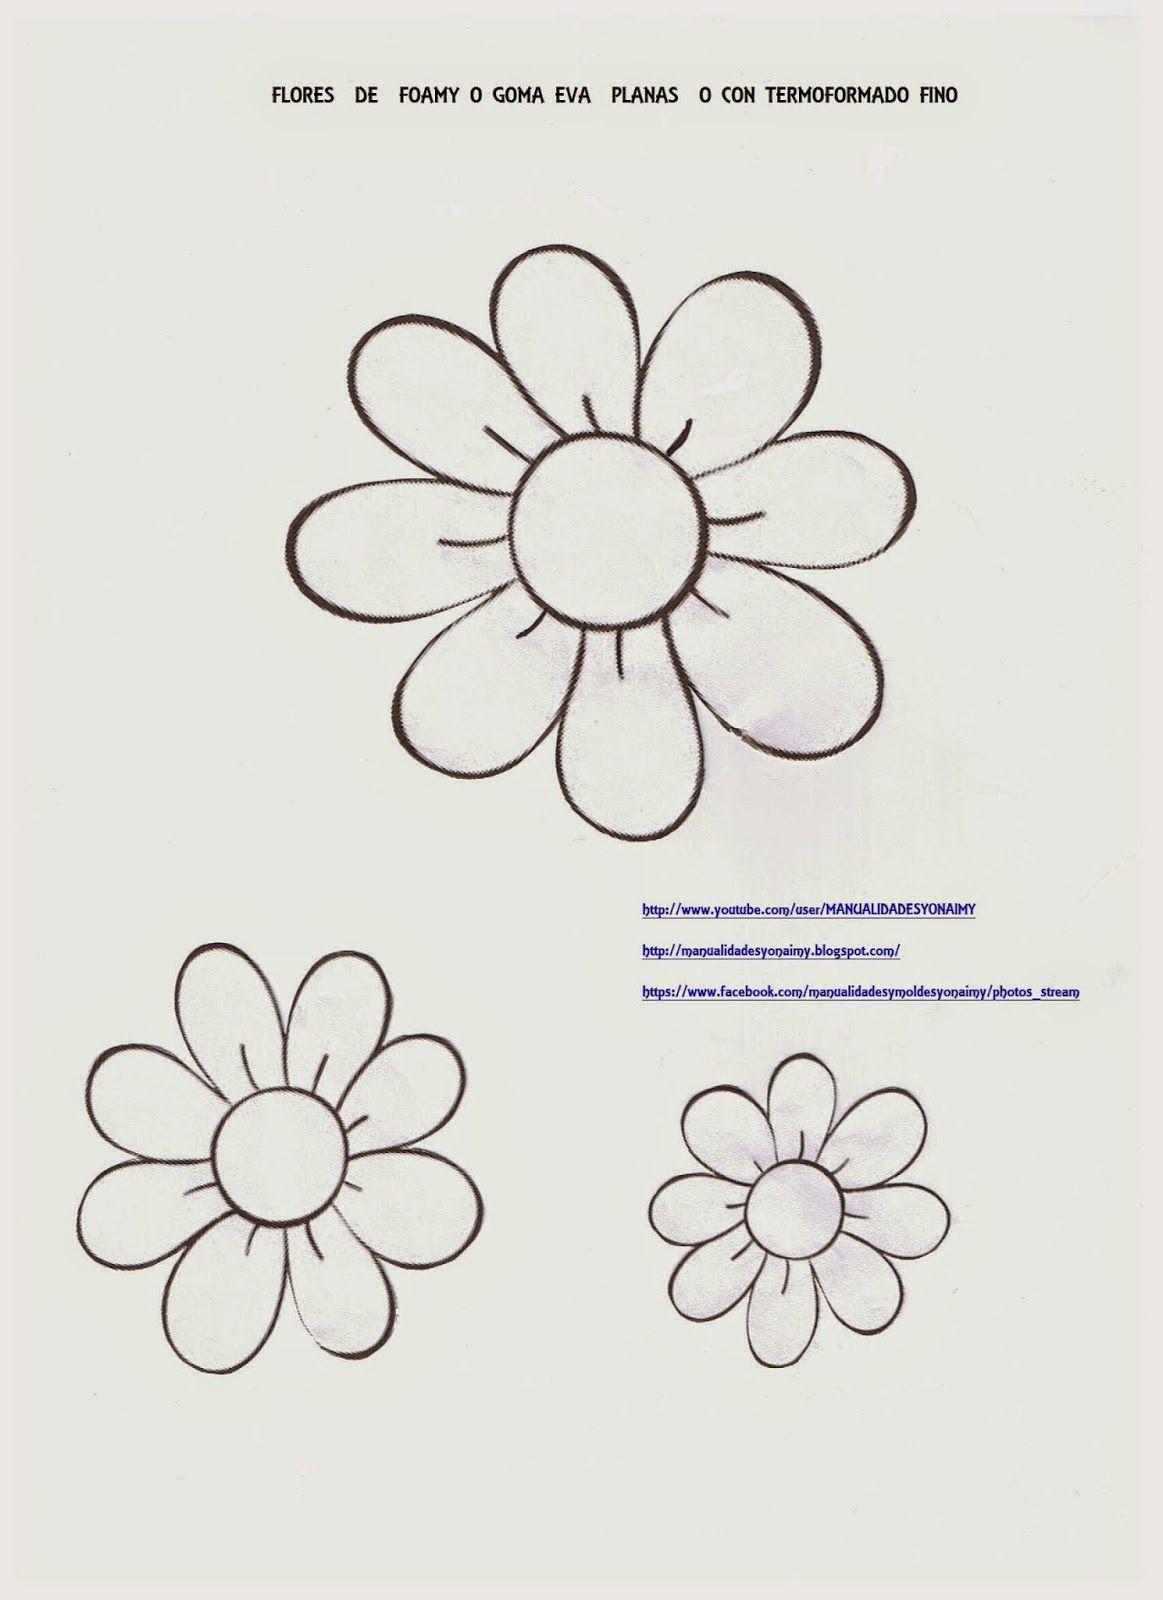 MANUALIDADES YONAIMY | Manualidades, Manualidades yonaimy, Espuma artesanal